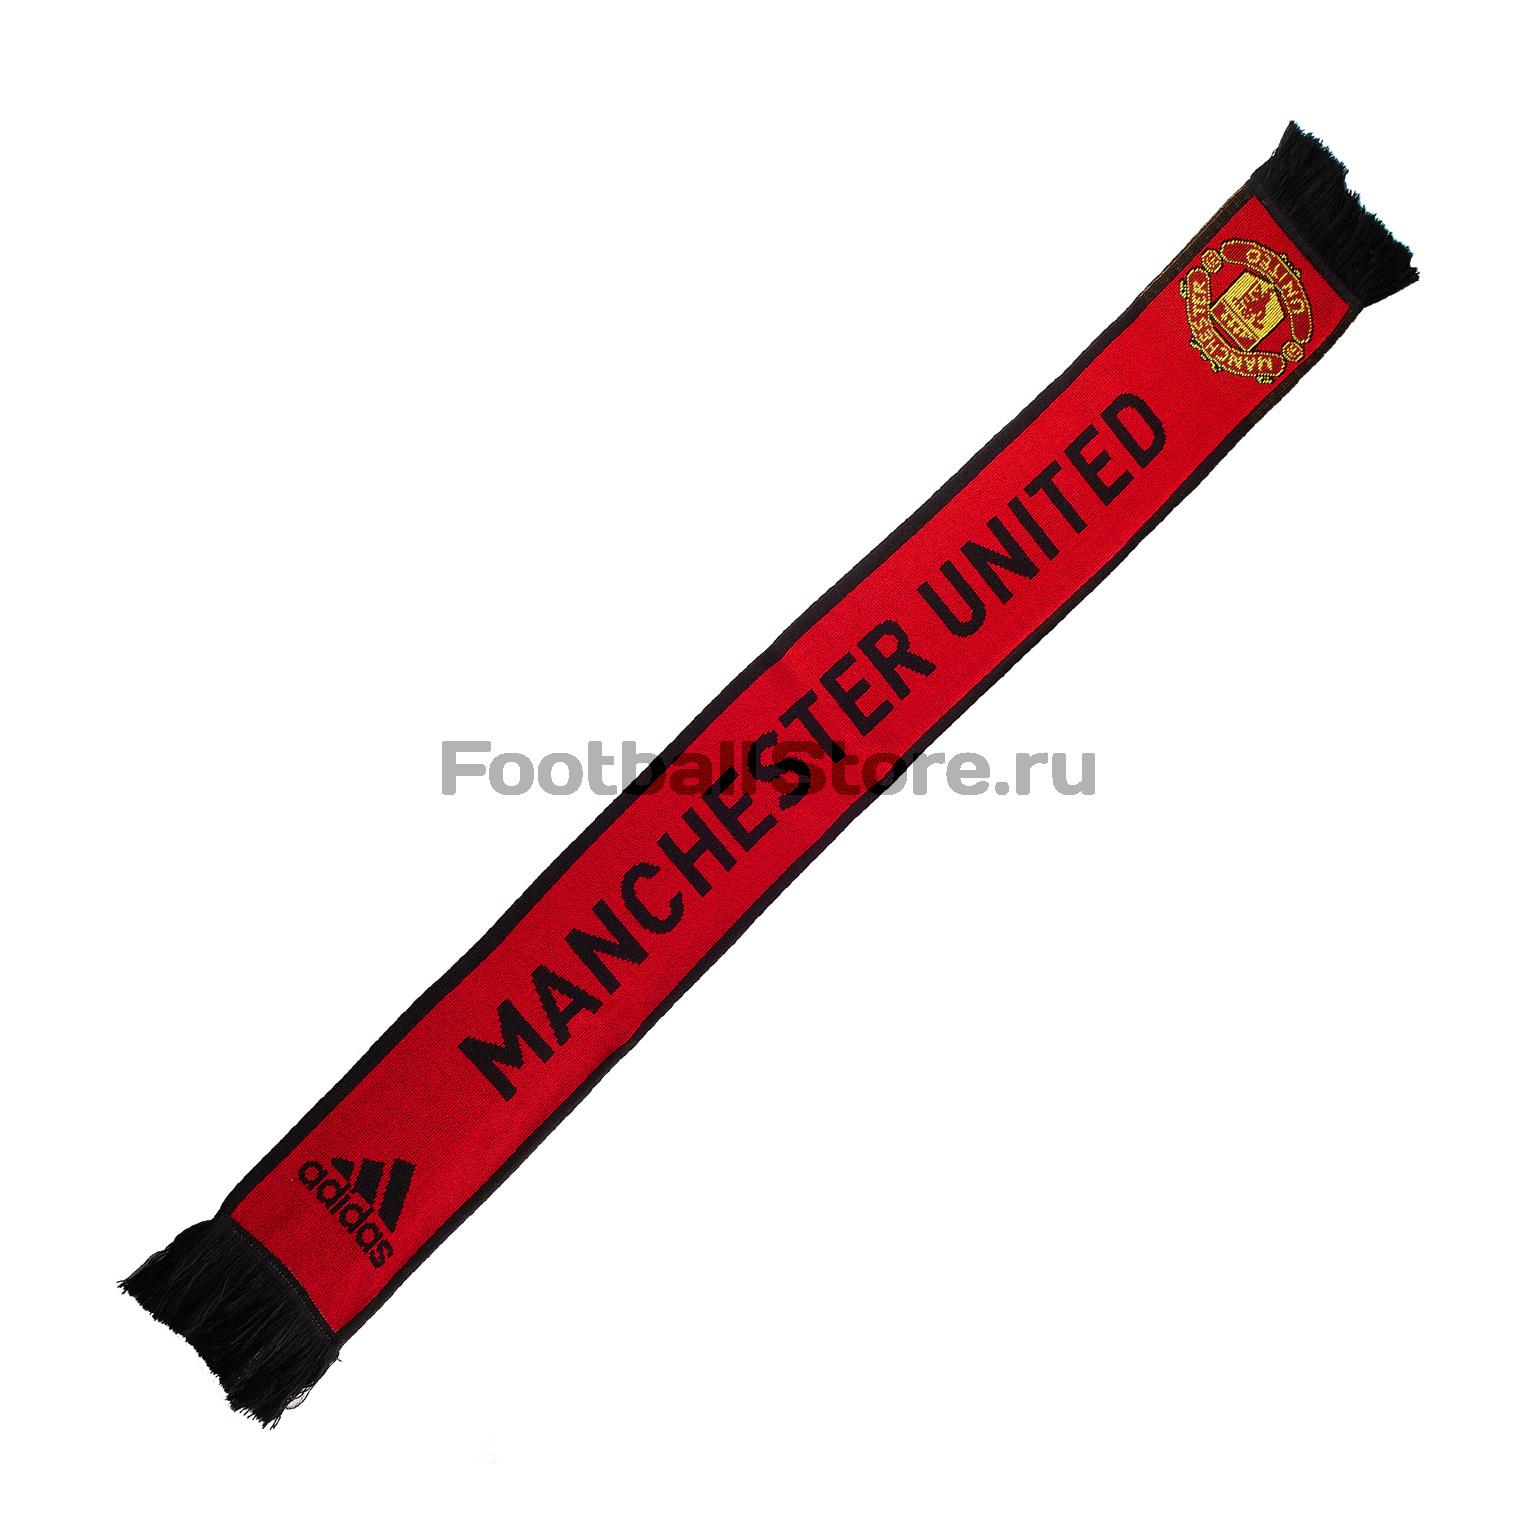 Фото - Шарф болельщика Adidas Manchester United Scarf CY5578 шарф спортивный adidas w cab scarf m66544